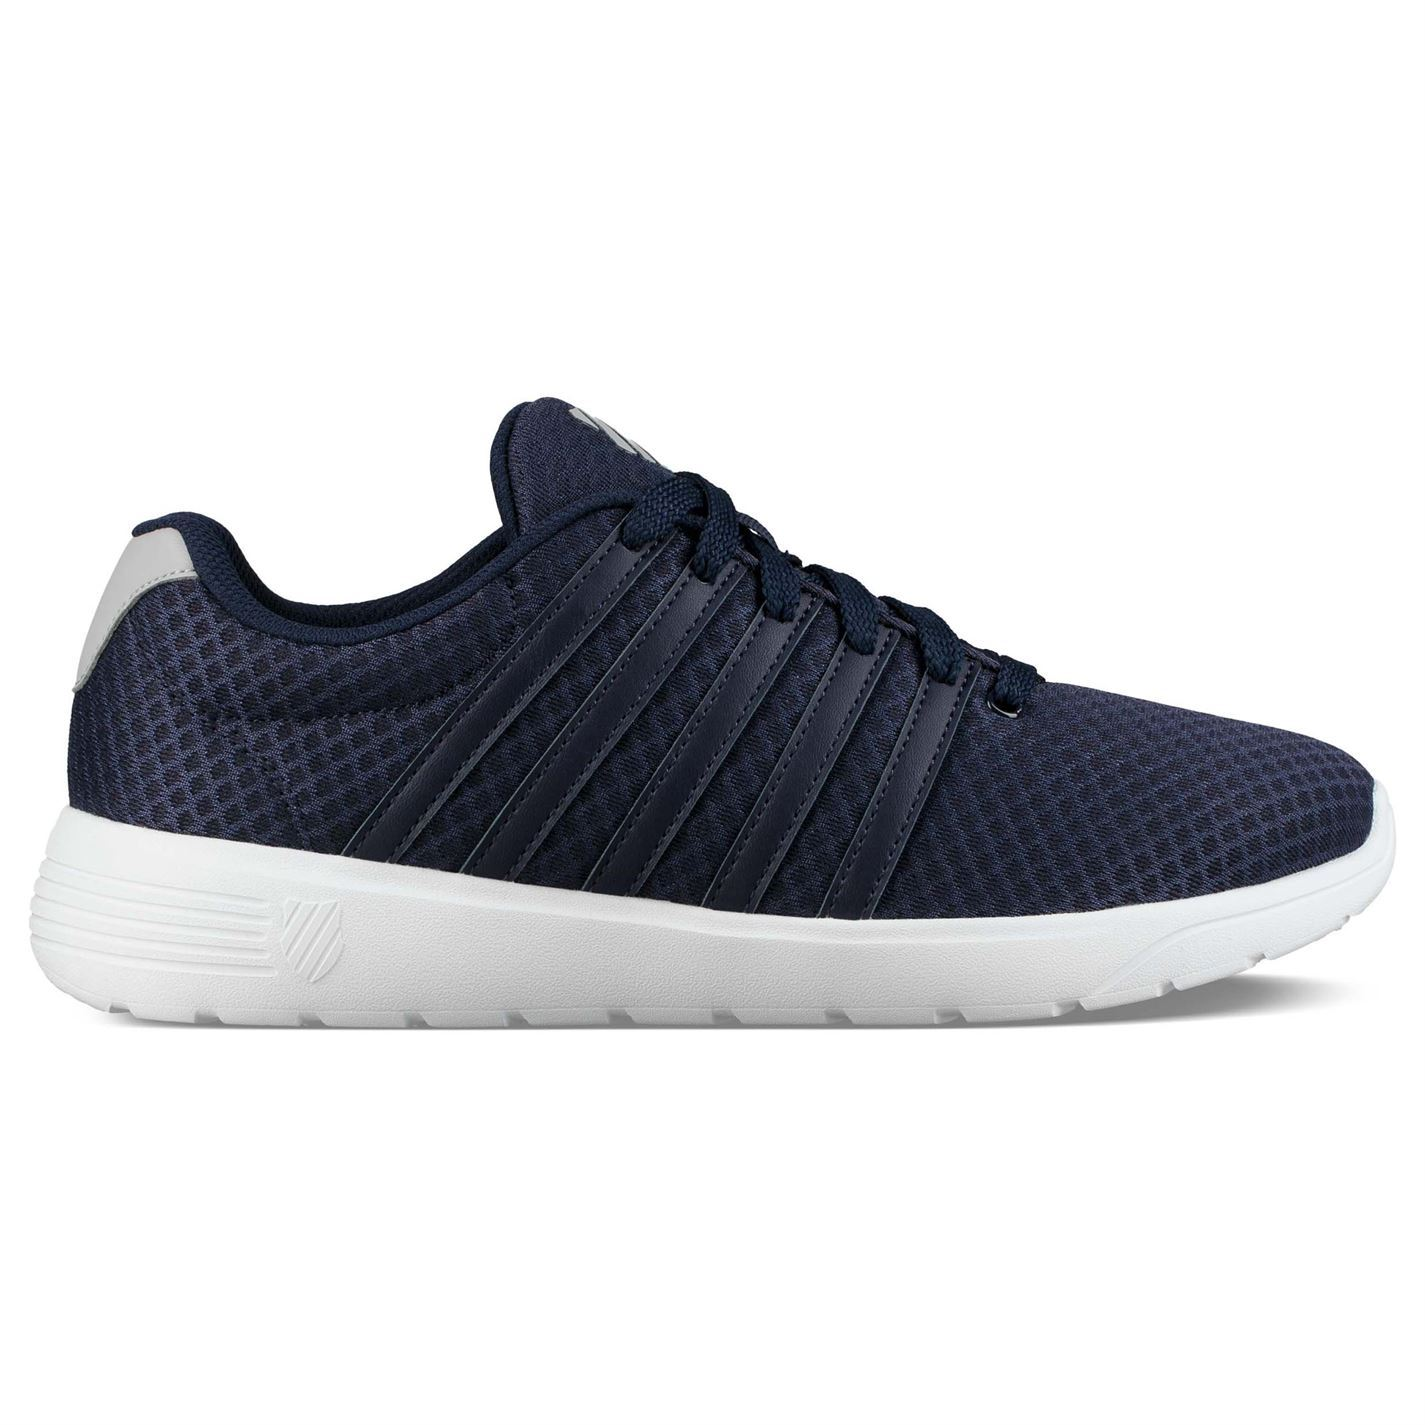 san francisco 5f2f4 f5104 K Swiss Empel Trainers Mens Athleisure Footwear Shoes ...